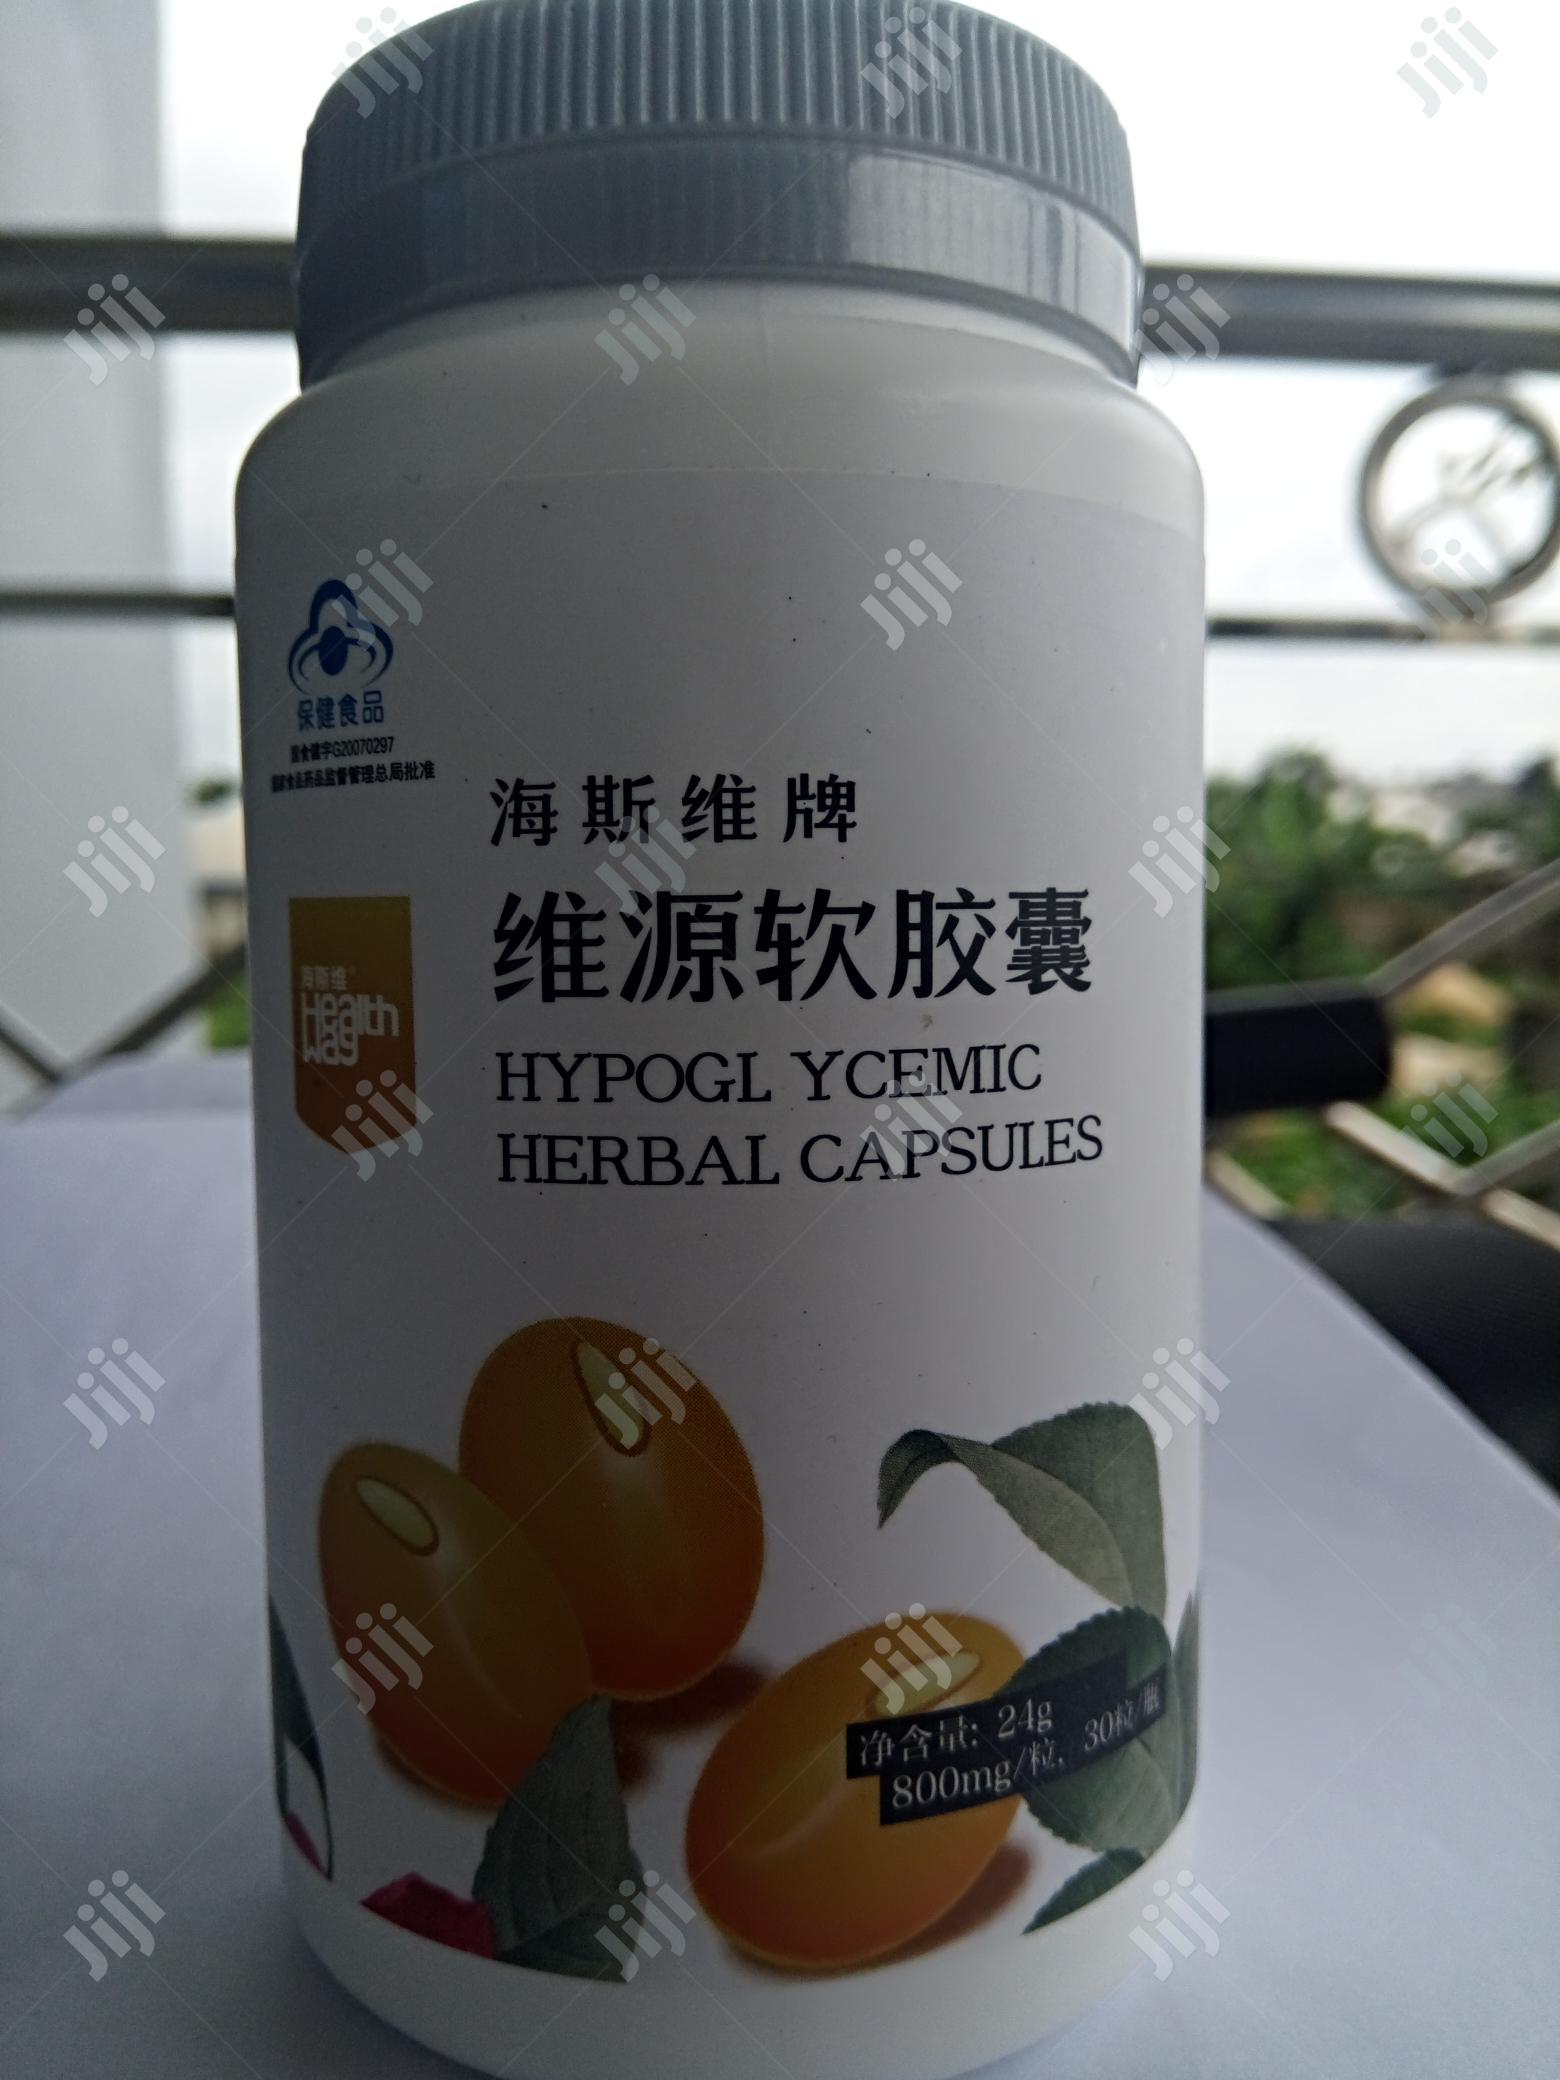 100% Cure For Hepatitis, Fatty Liver, Liver Damage.Hypoglycemic Herbal